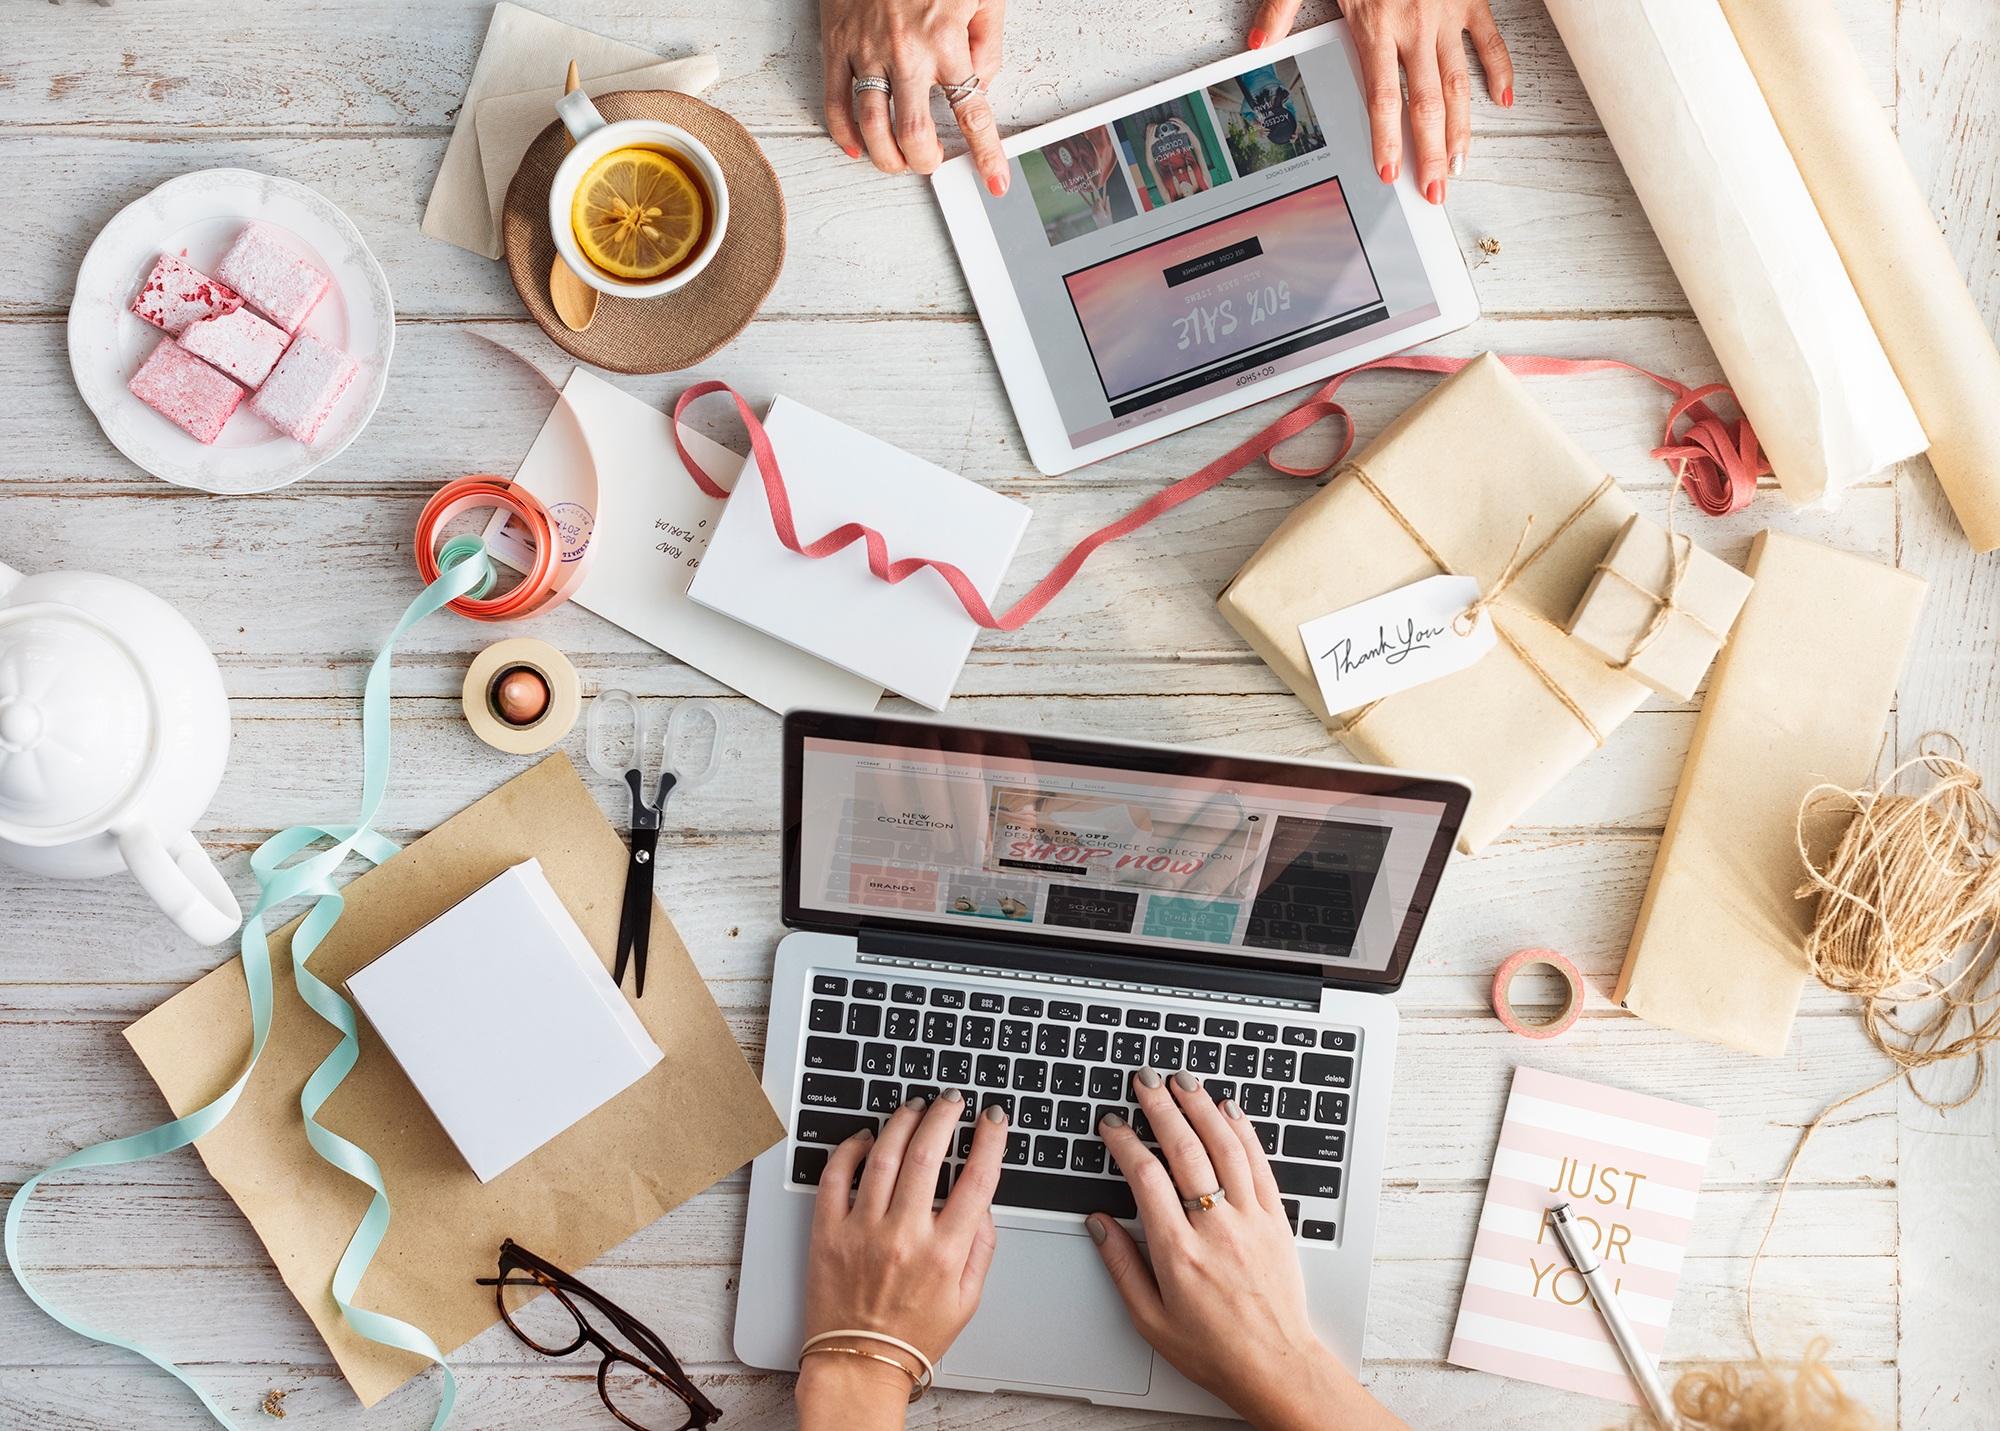 15 best value stock image subscription sites 2018 webjess com